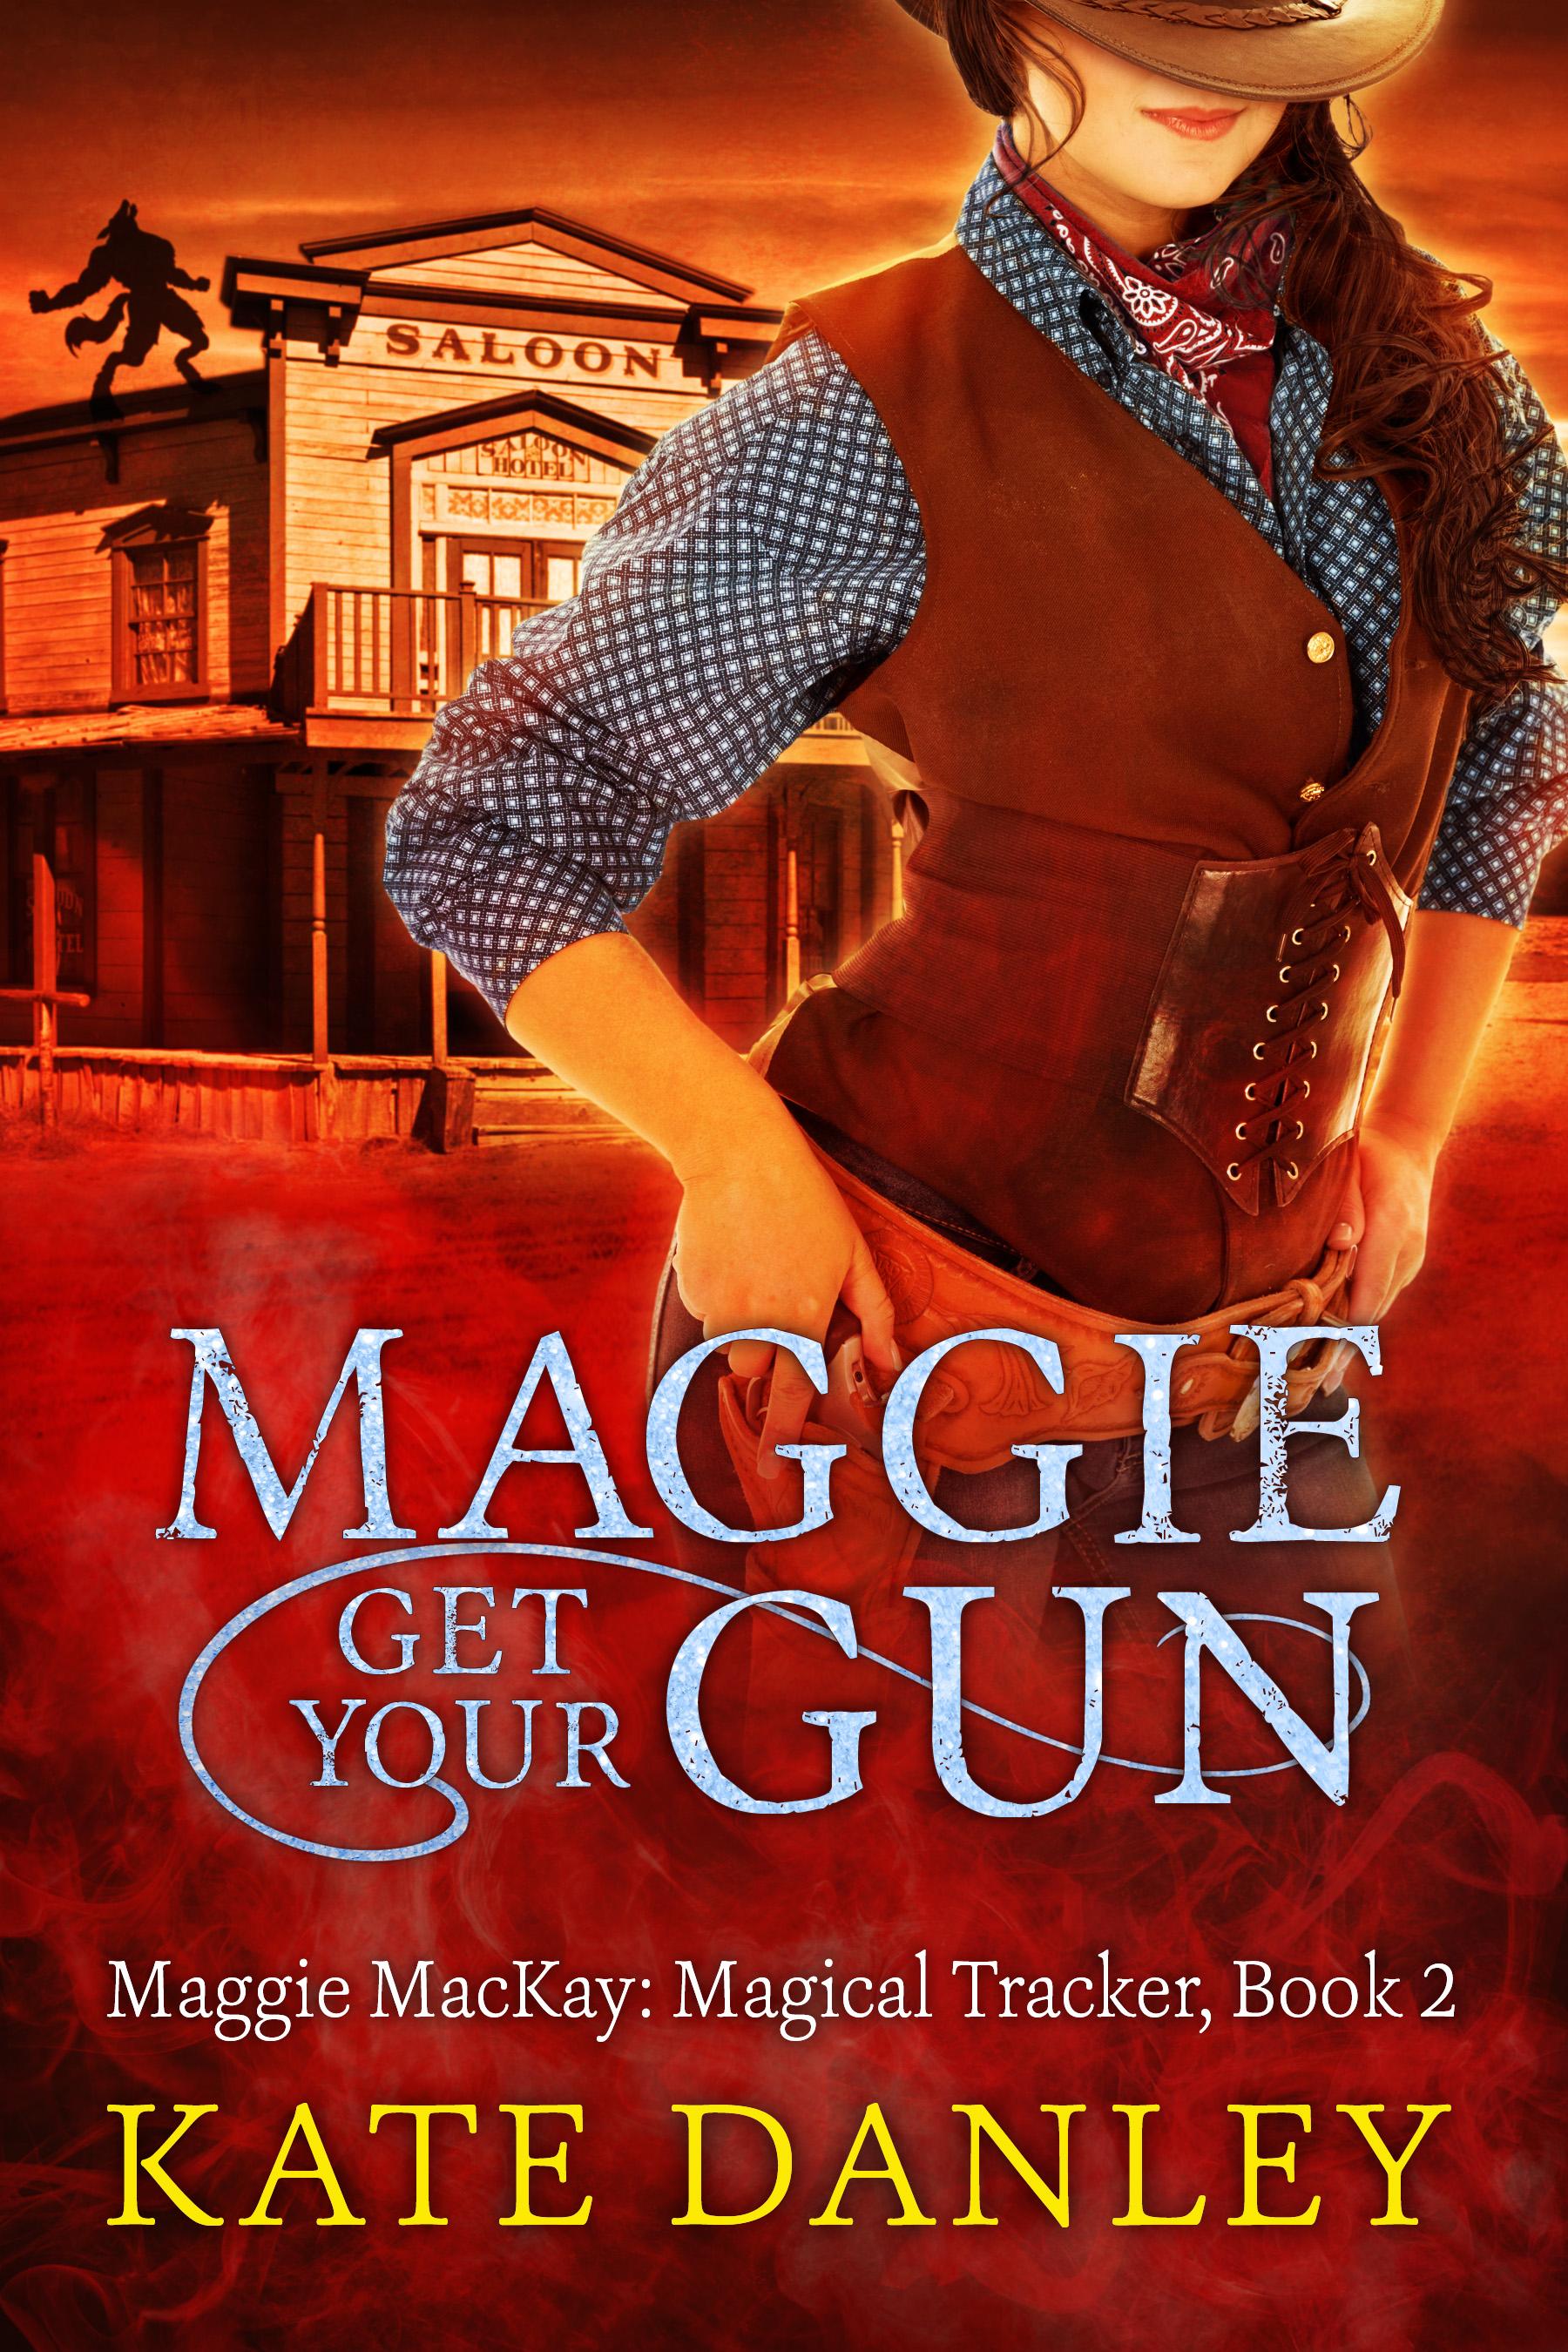 Maggie-Get-Your-Gun_ebook.jpg